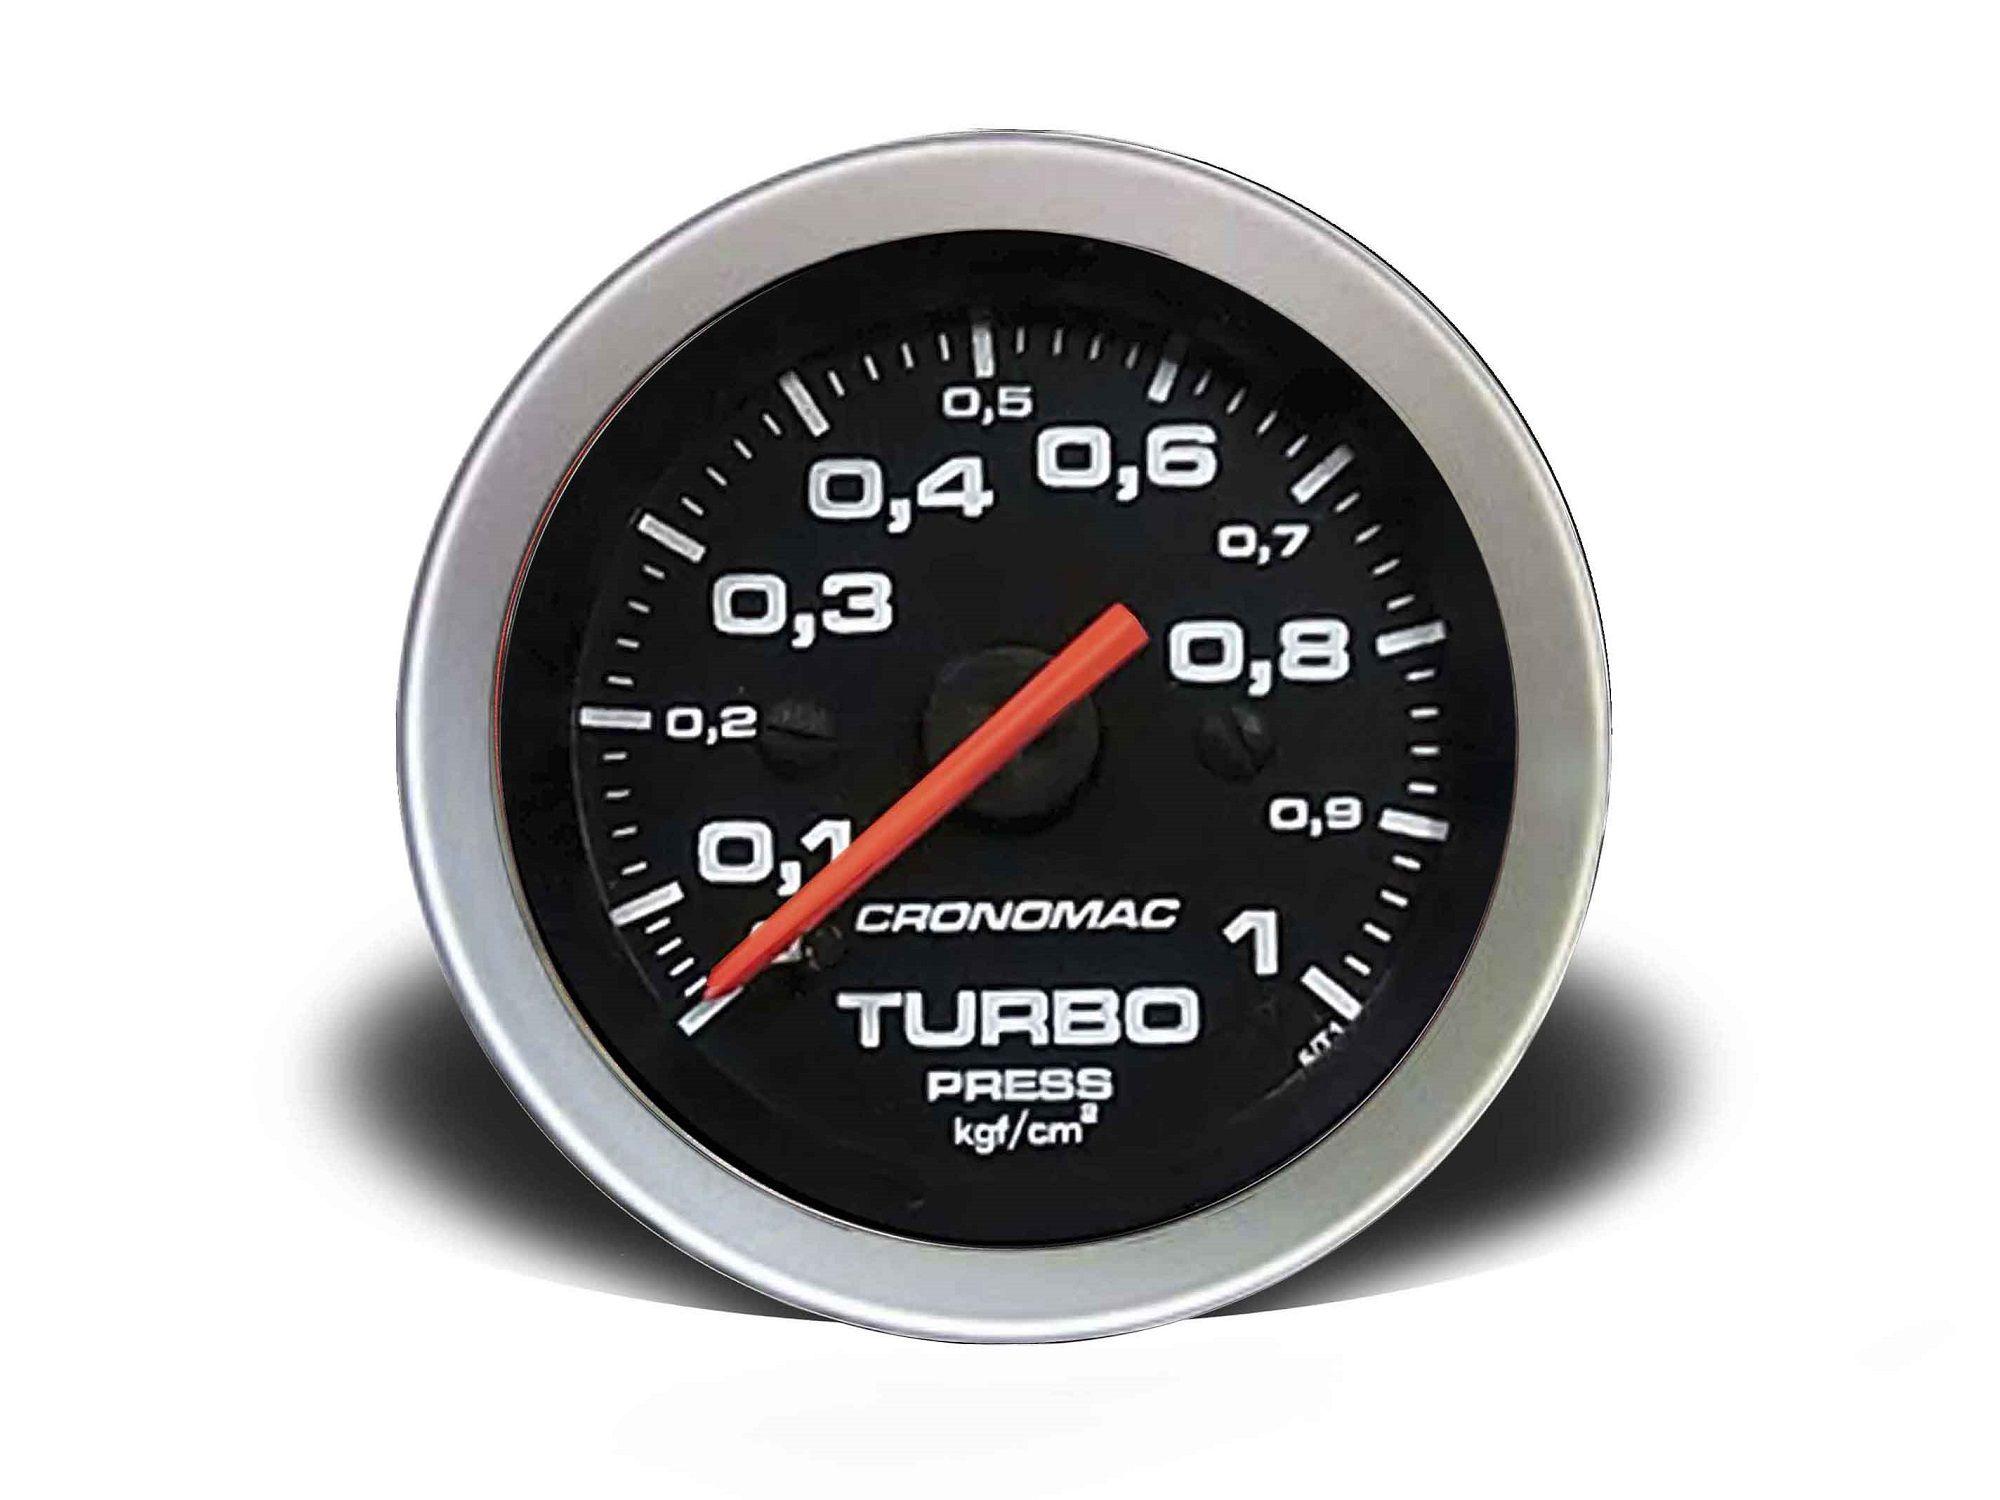 Relogio Pressao de Turbo 1kg Sport 52mm Cronomac